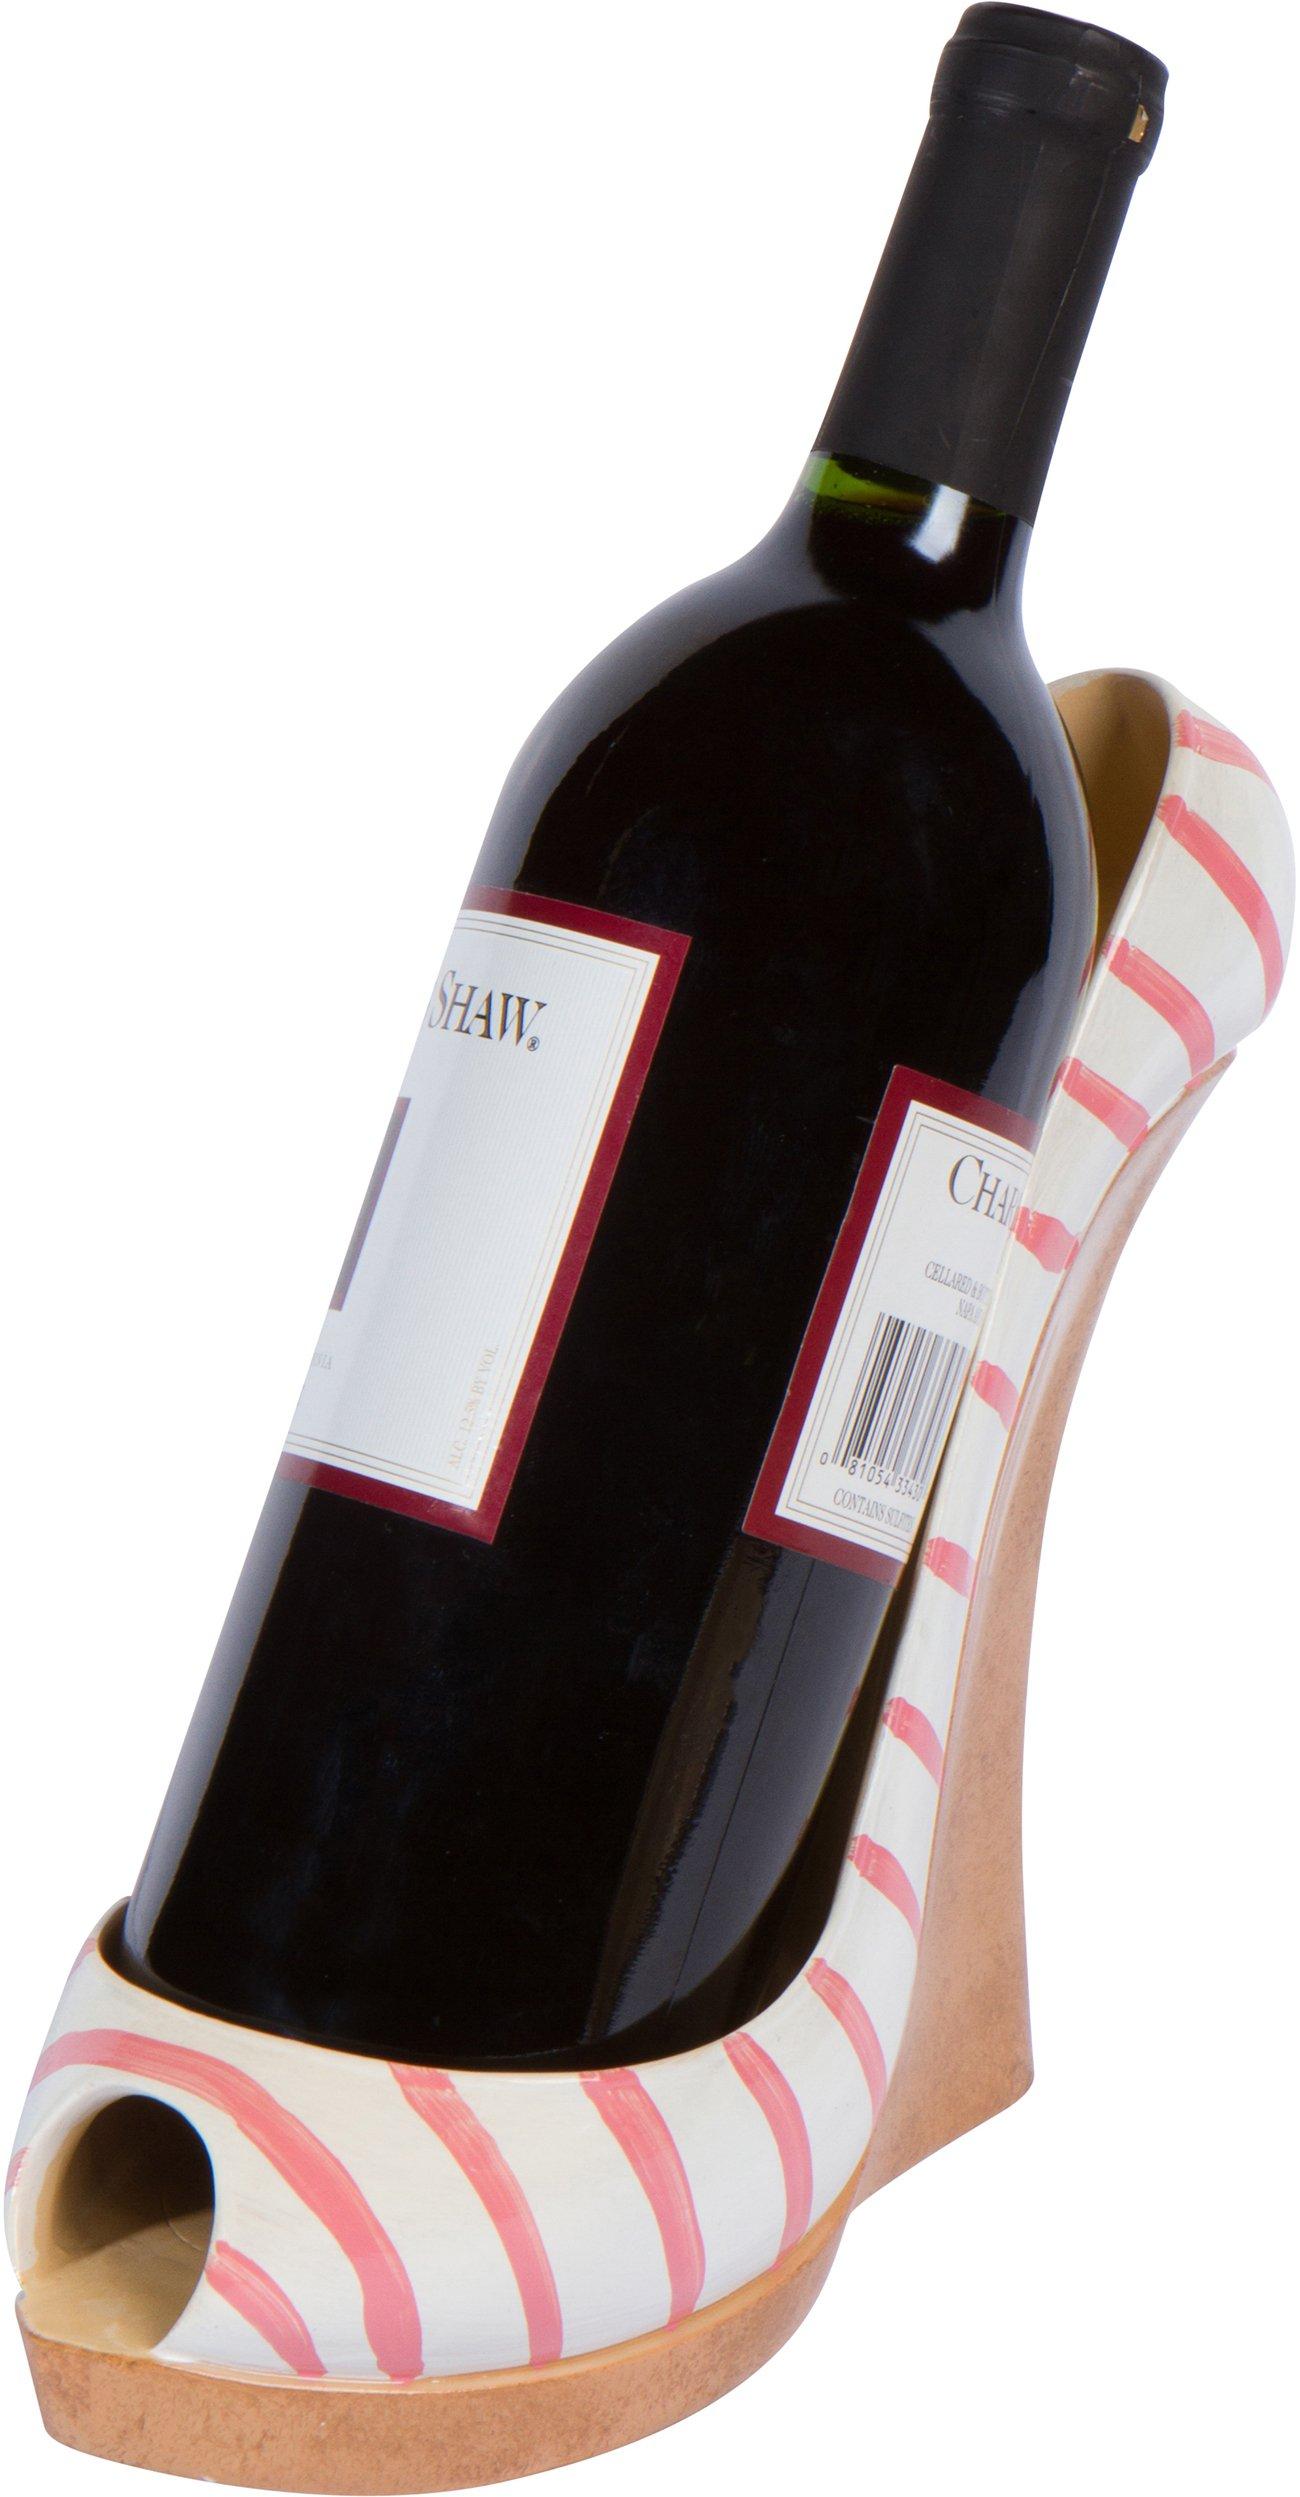 7.8'' x 7''H Wedge High Heel Wine Bottle Holder - Stylish Conversation Starter Wine Rack By Hilarious Home (Pink Stripe)